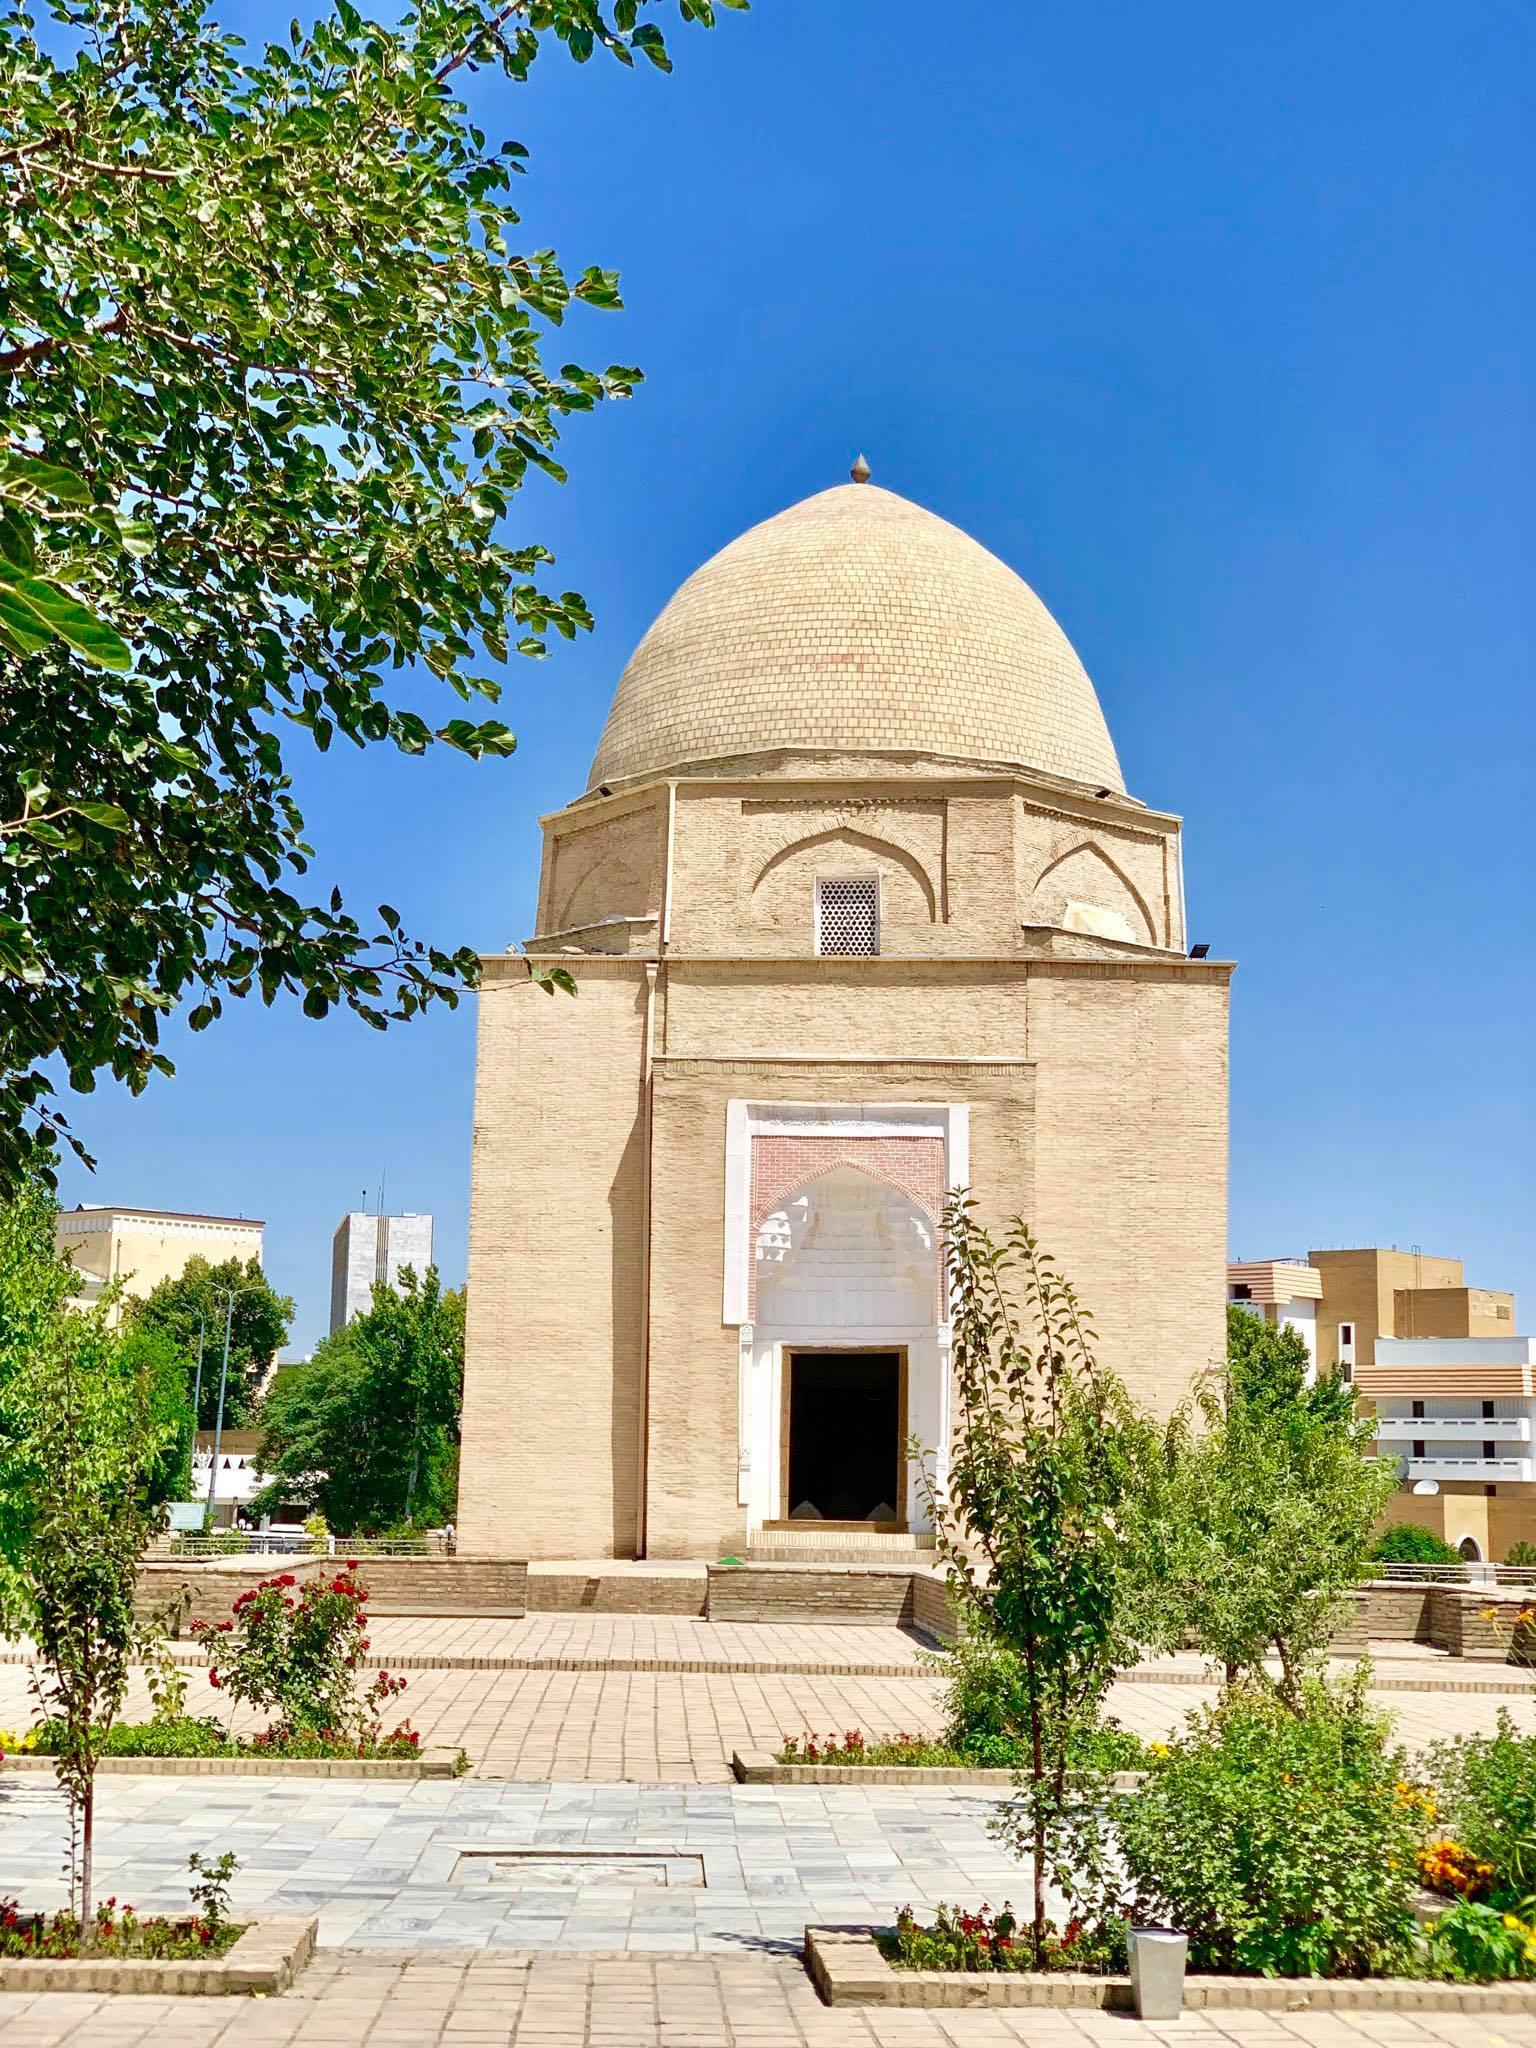 Kach Solo Travels in 2019 Siyab Bazaar and Registan on my first day in Samarkand1.jpg